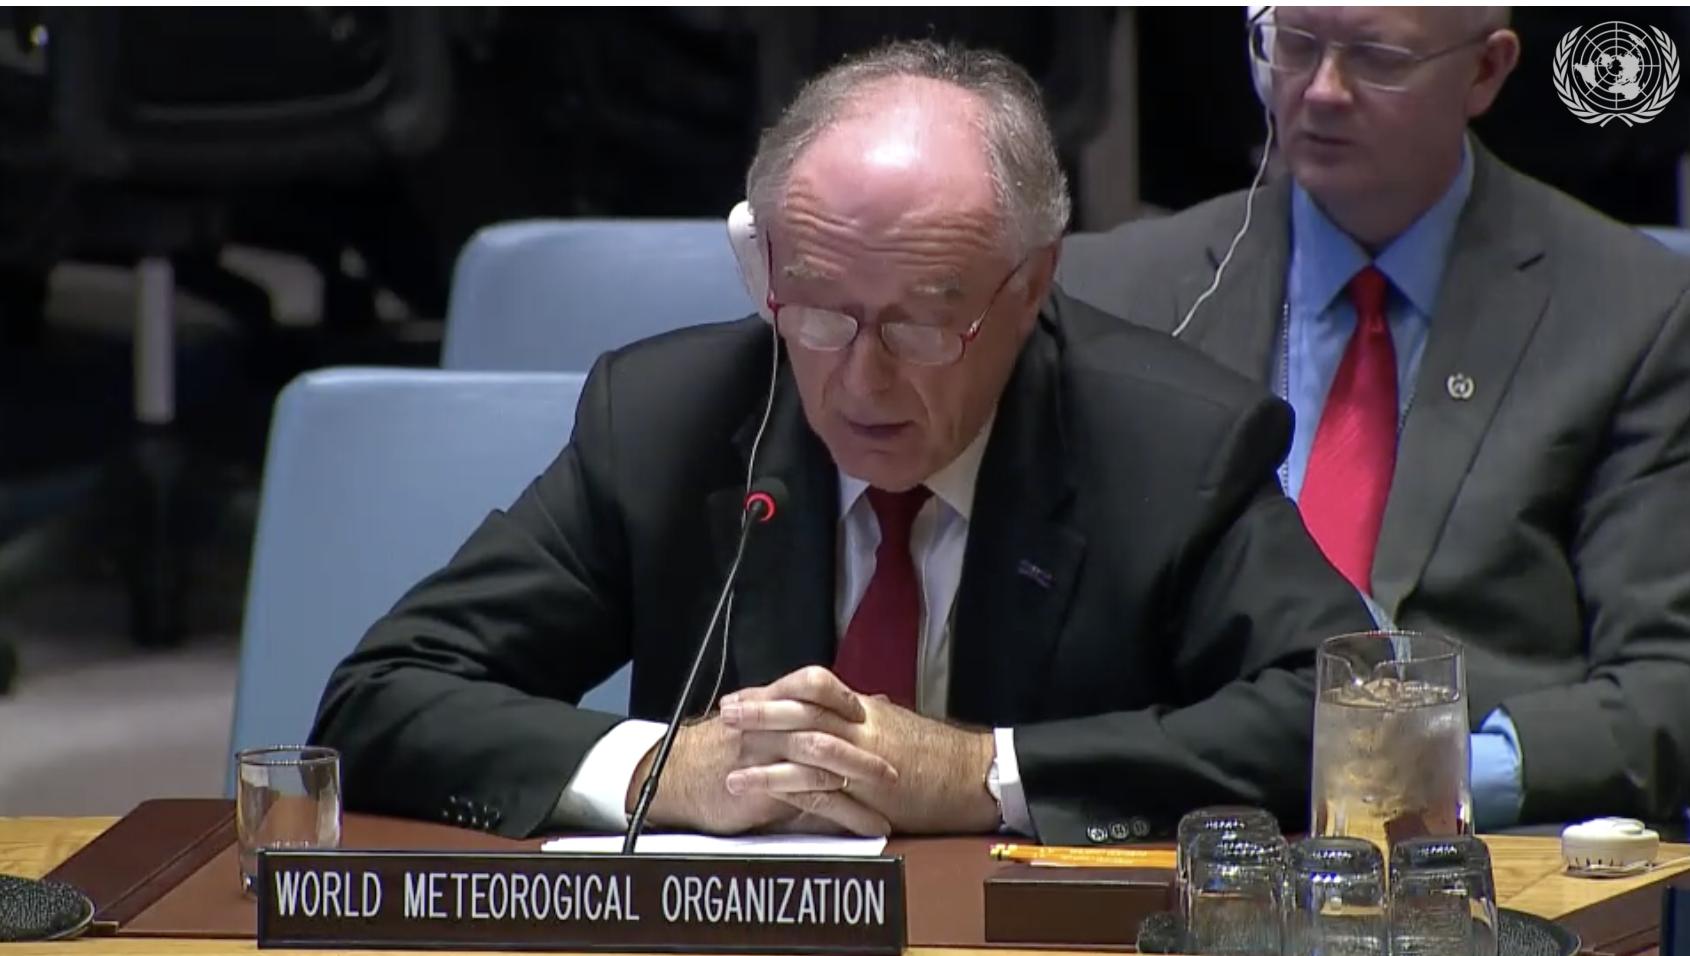 WMO chief scientist Pavel Kabat addresses UN Security Council 25.1.2019